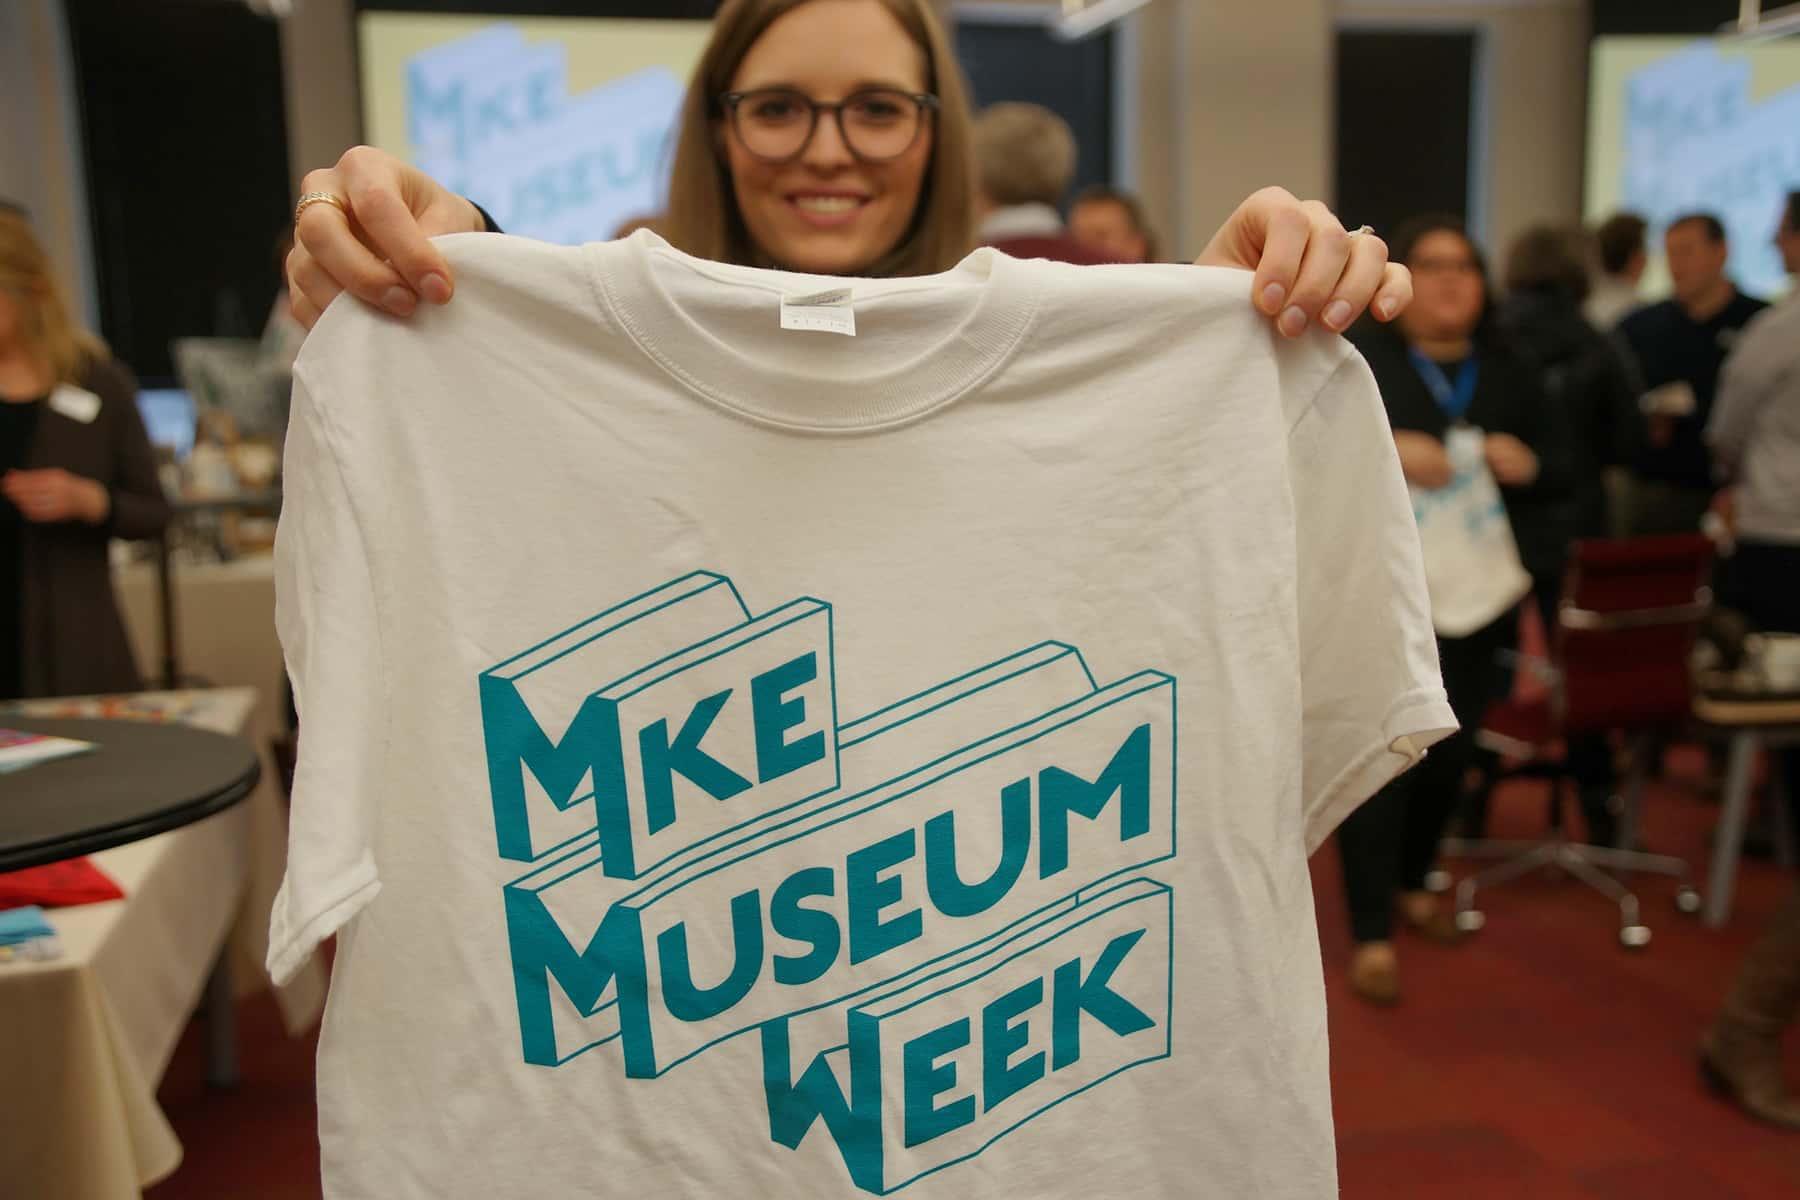 01_011720_museumweek2020_06